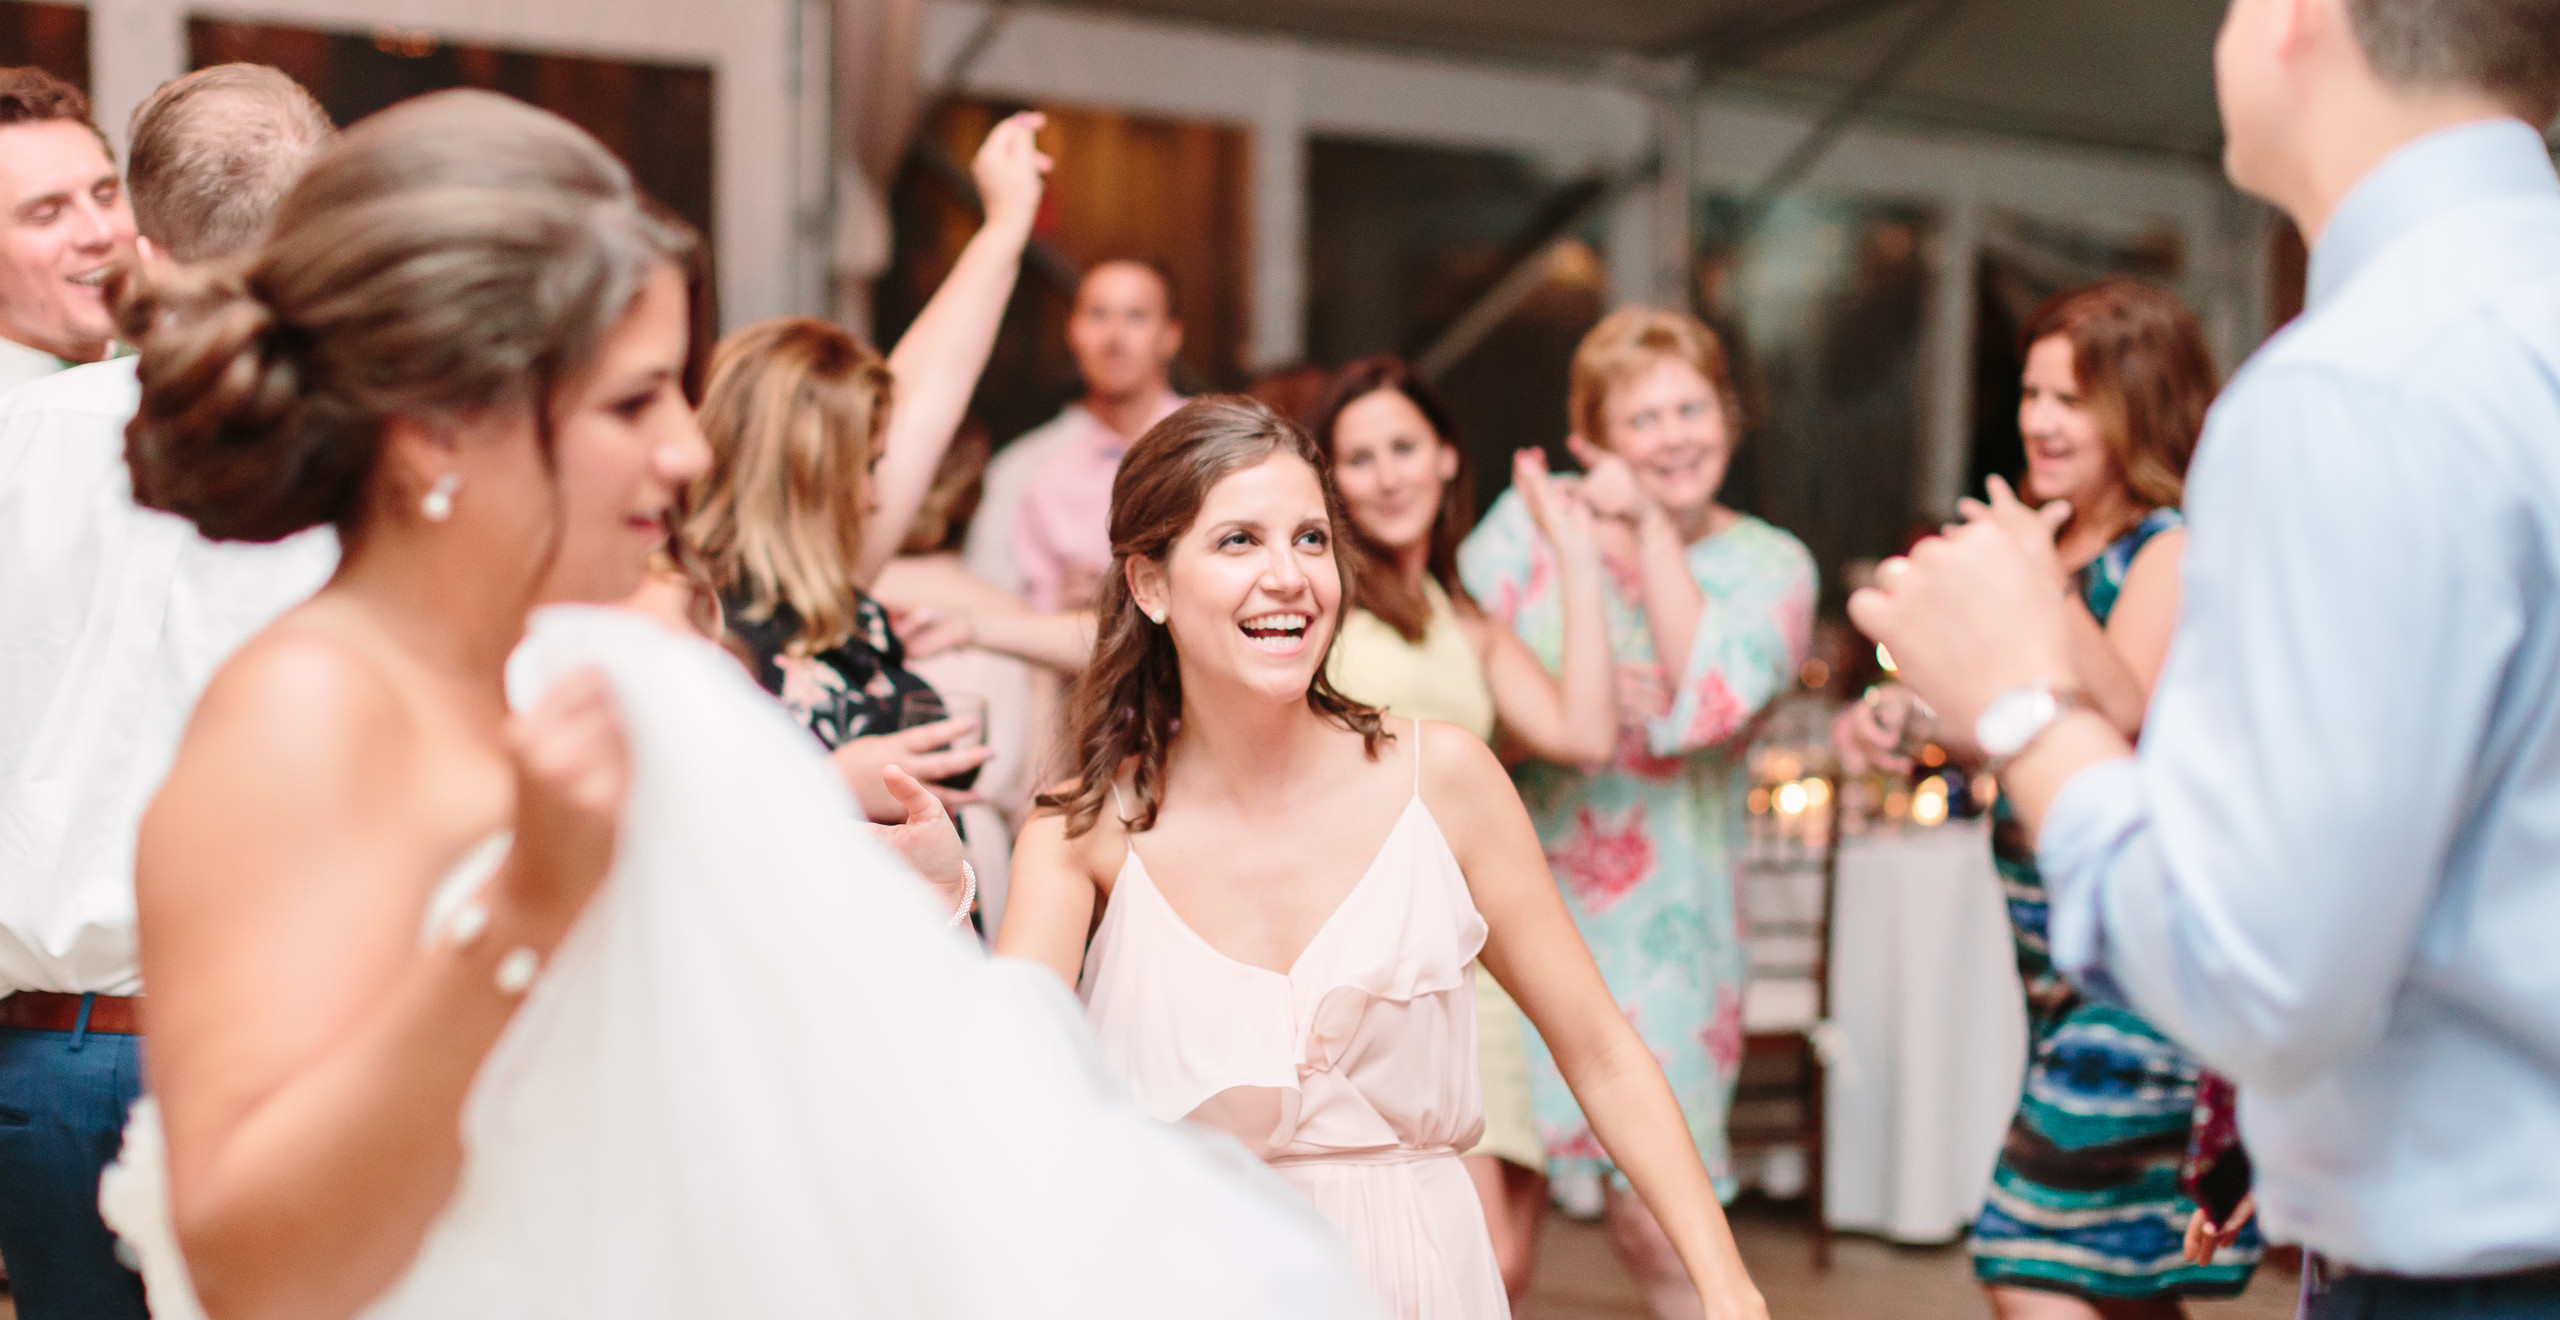 bridesmaid dancing and smiling